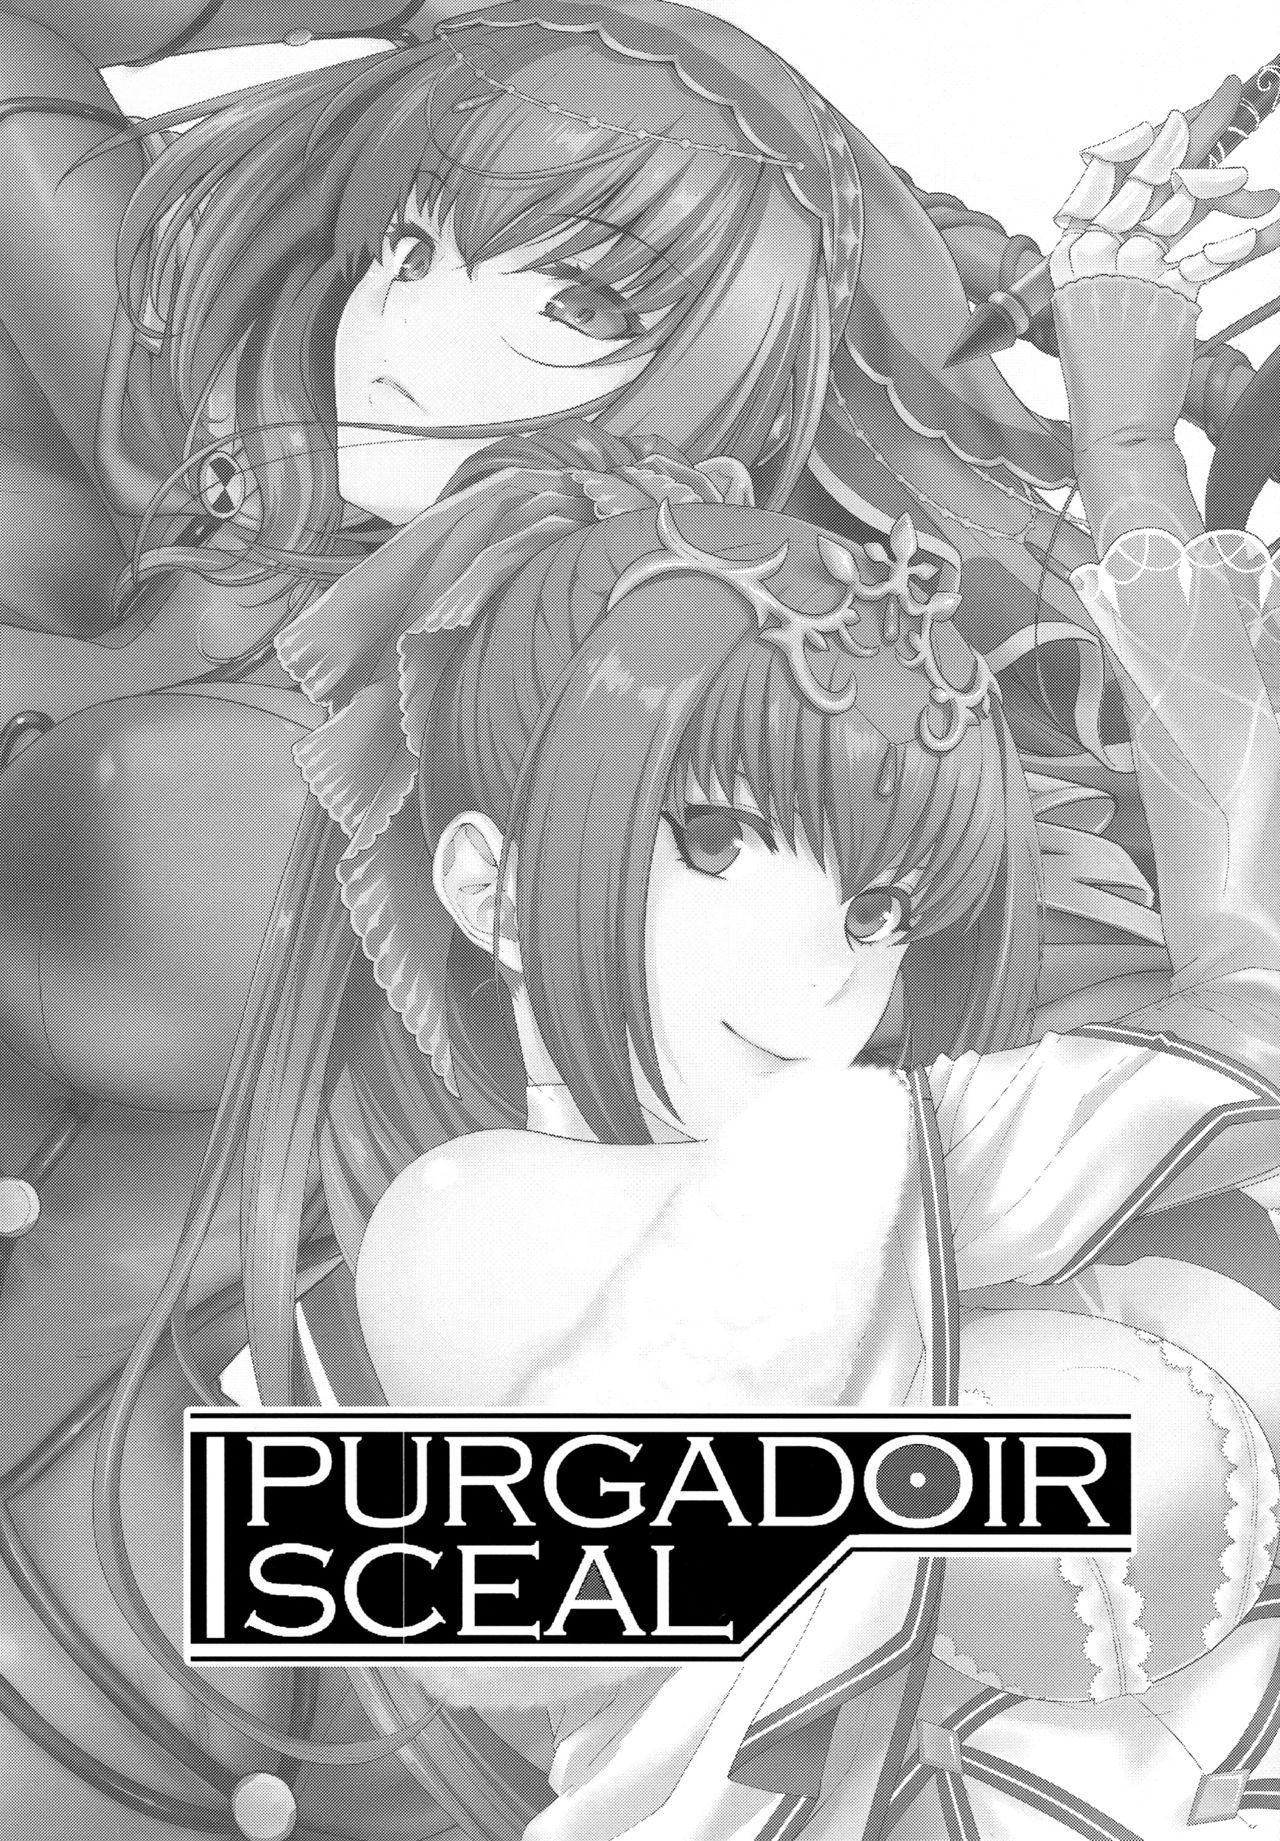 PURGADOIR SCEAL 1